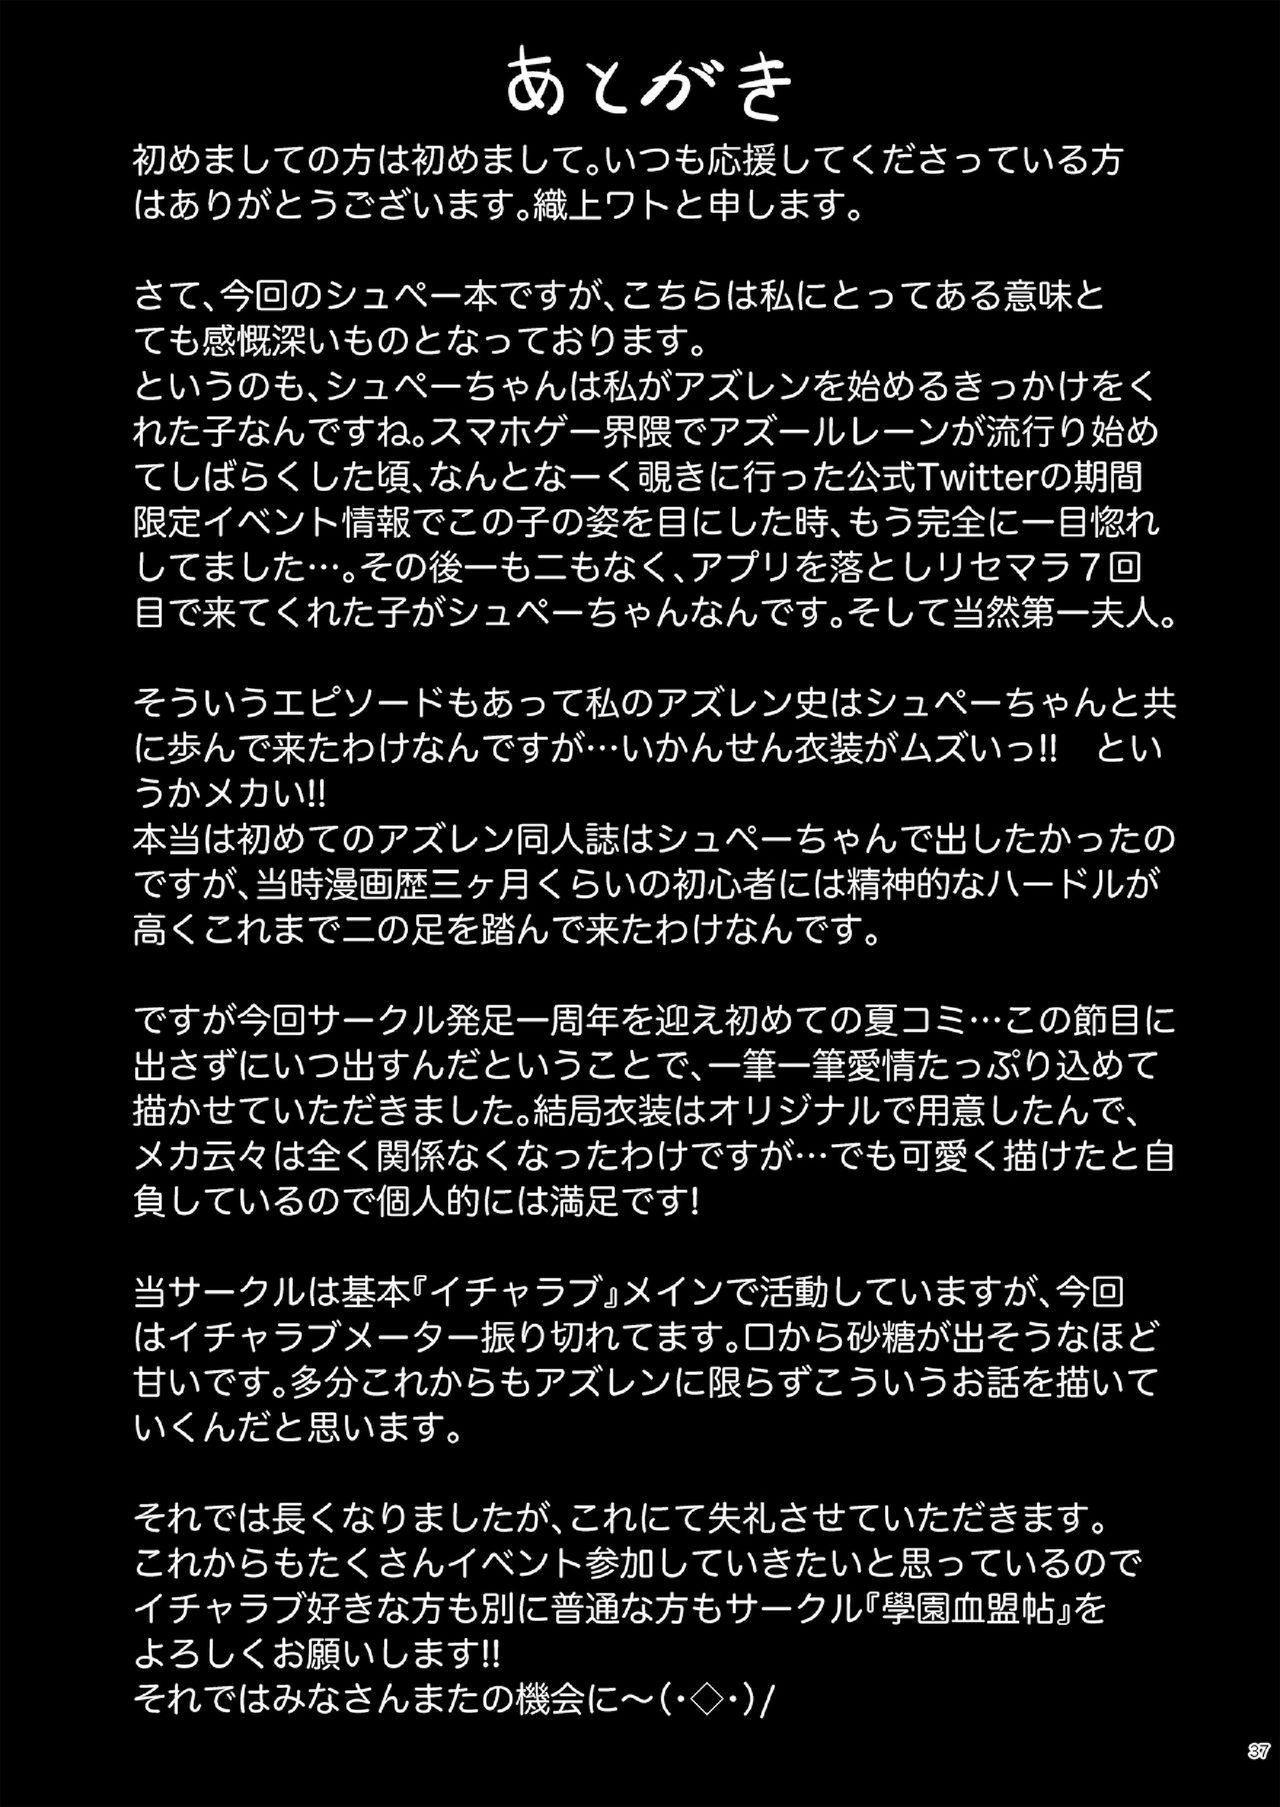 Afureru Kurai, Kimi ga Suki. | I love you so much, that I can't contain it 37